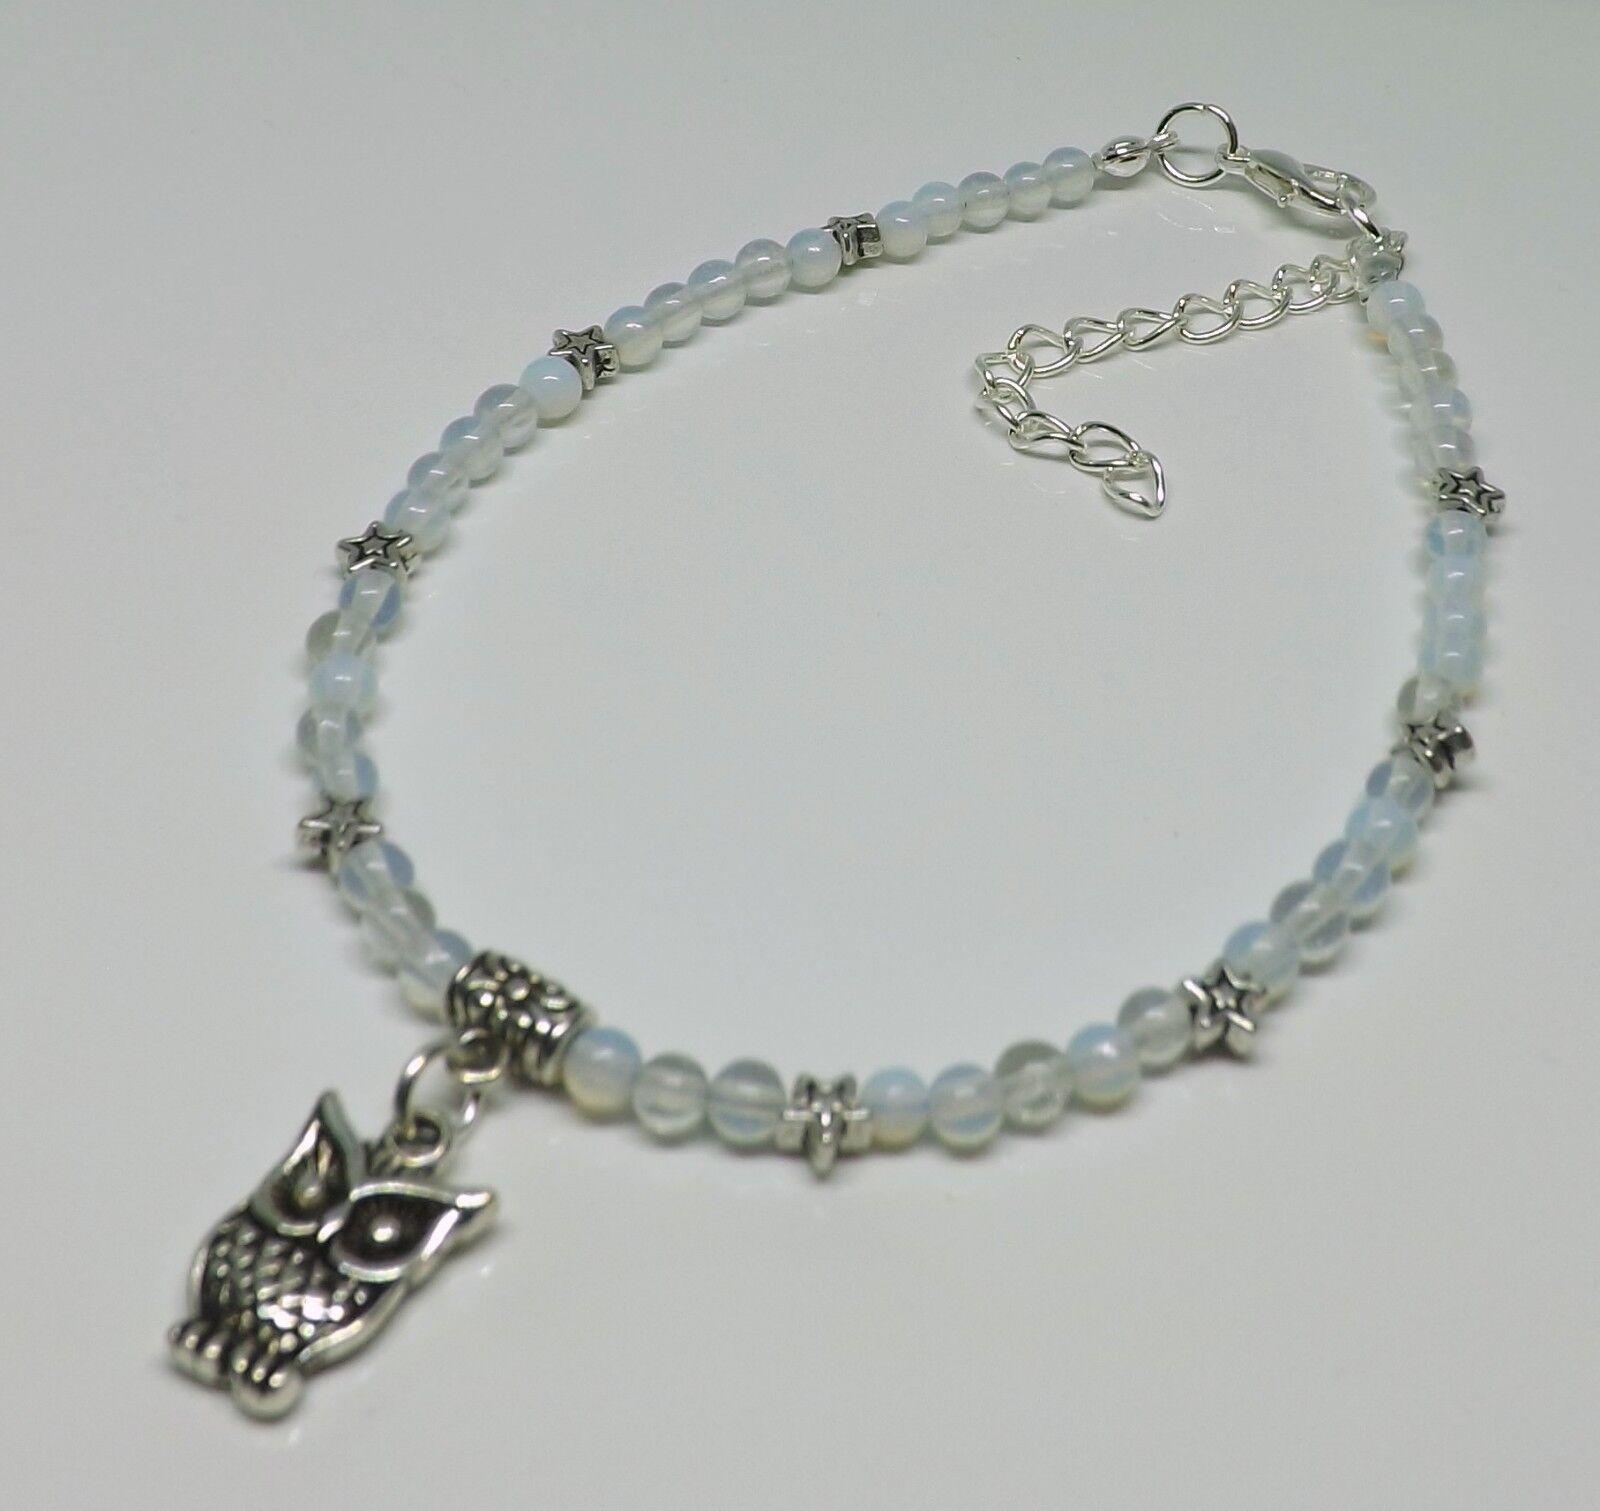 Moonstone 4mm Gemstone Beads Owl Charm